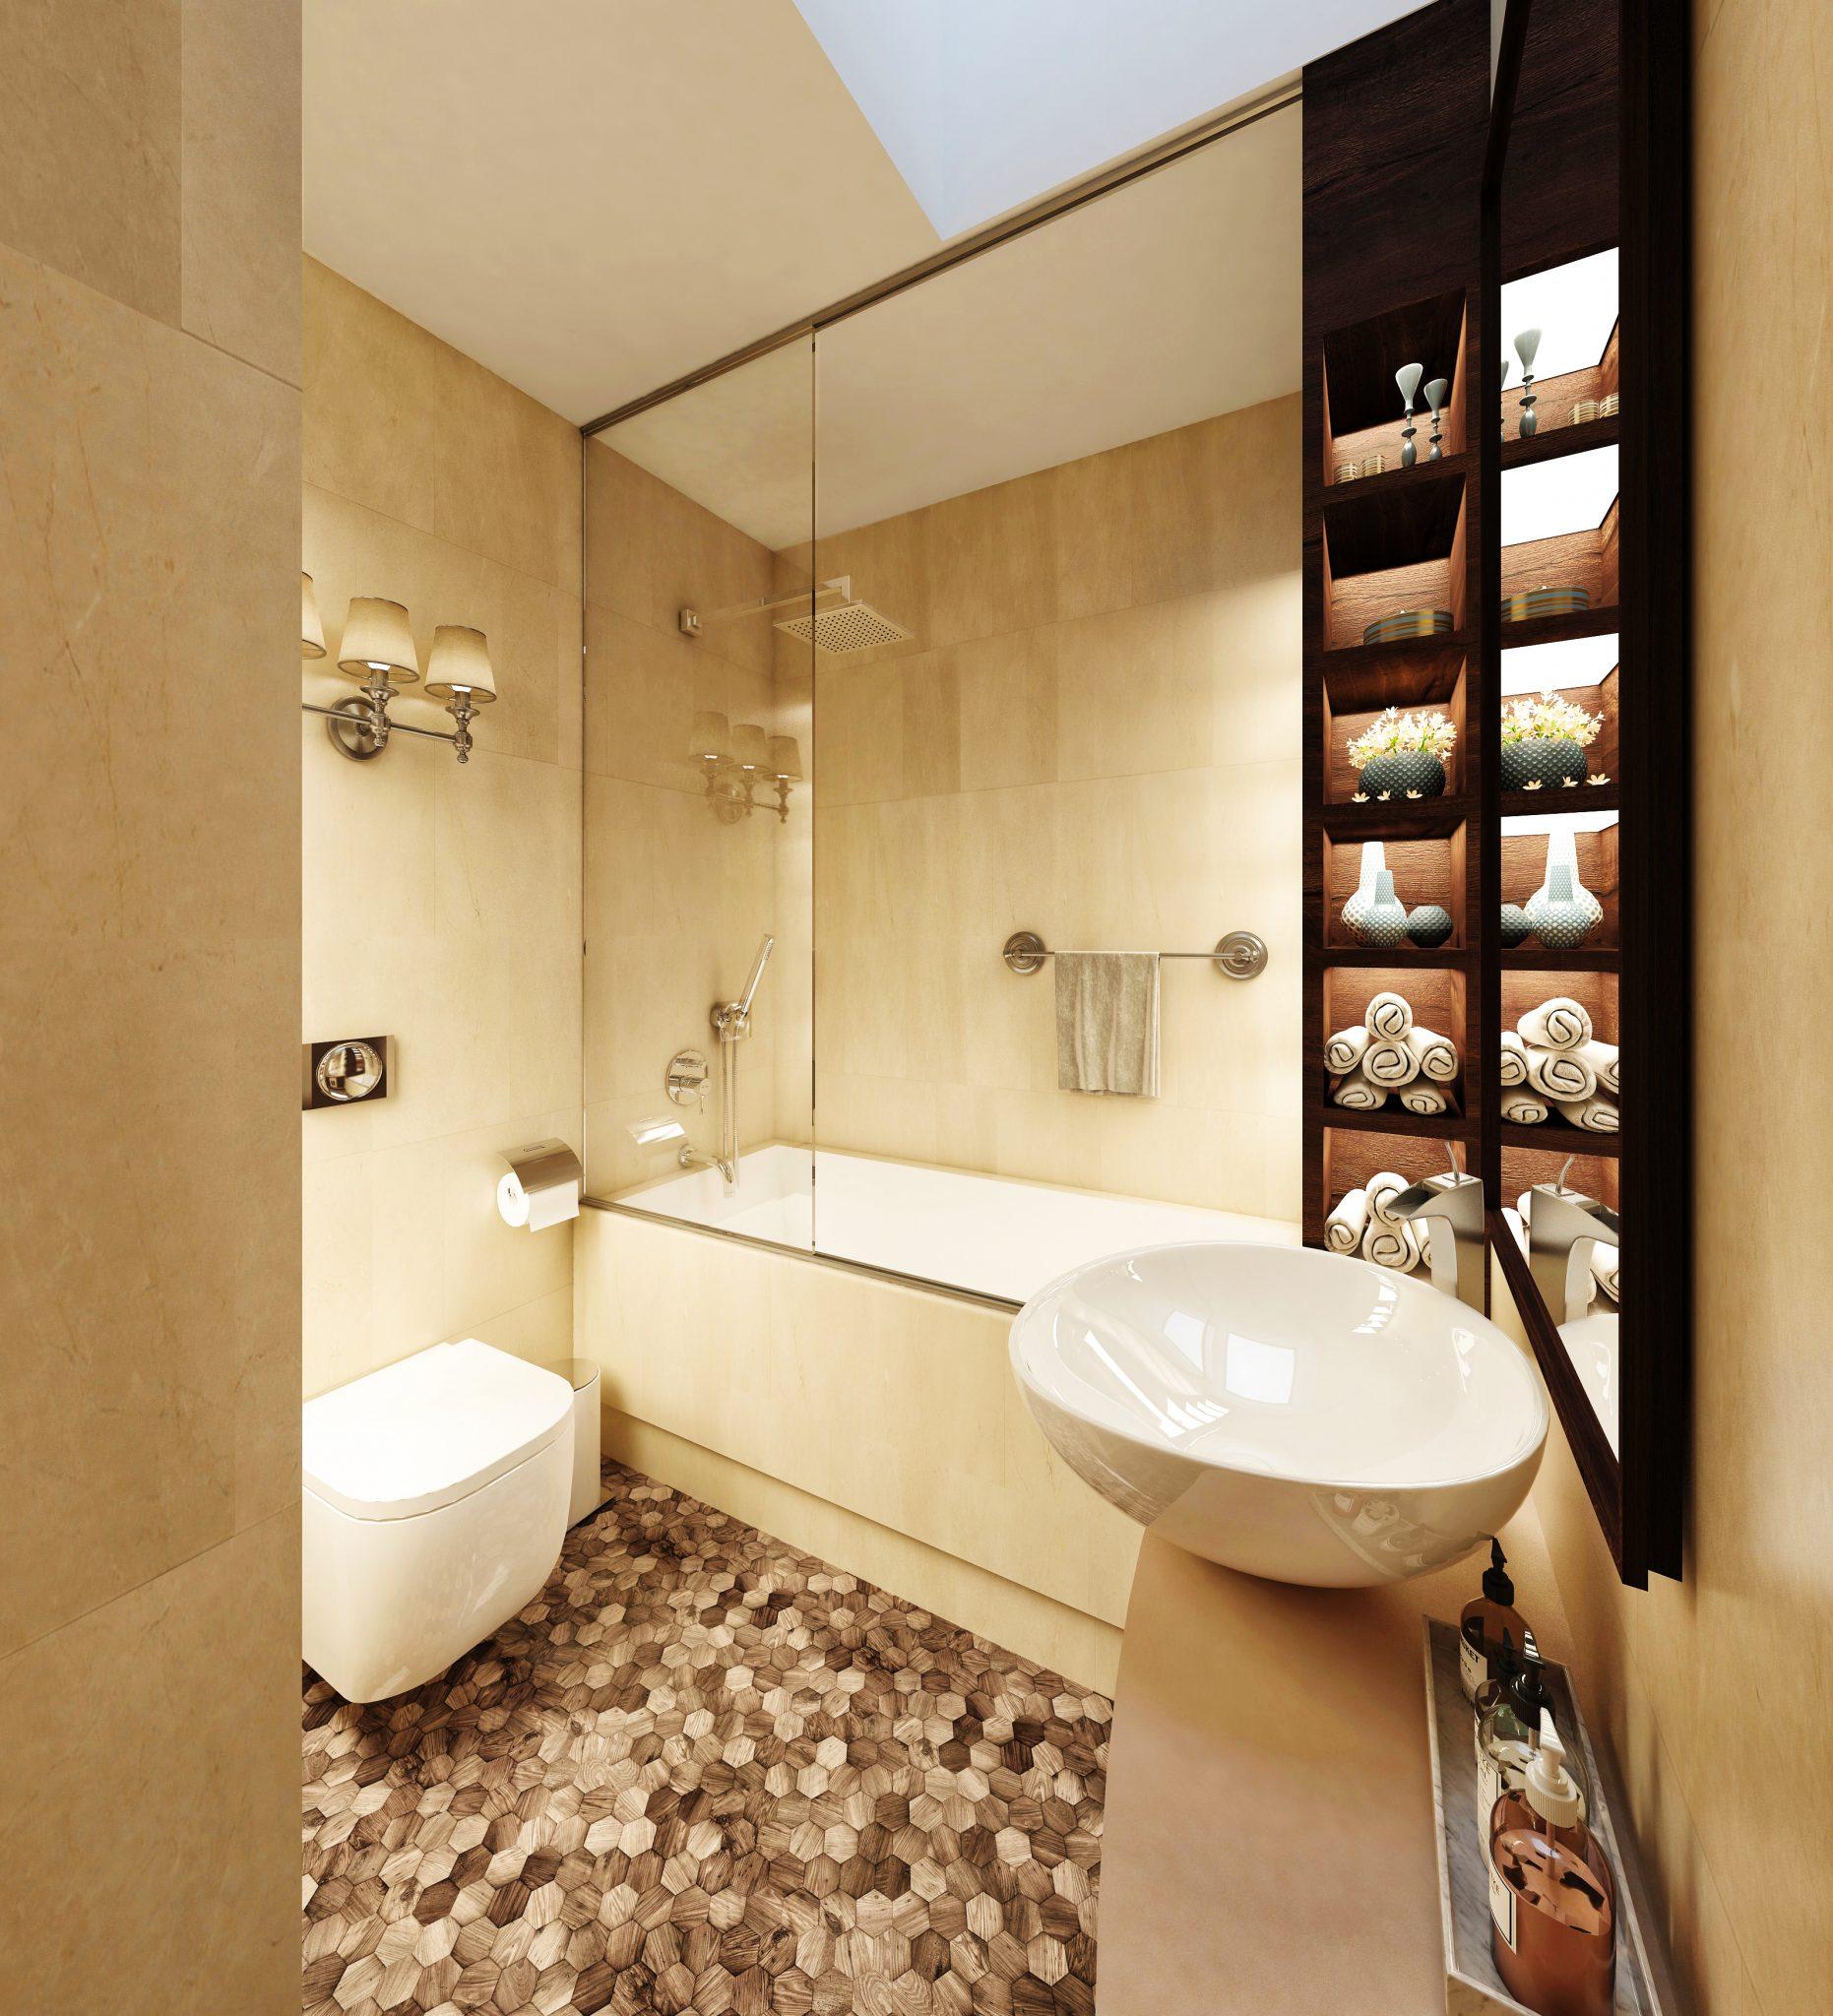 466-Bathroom Visualisation v4